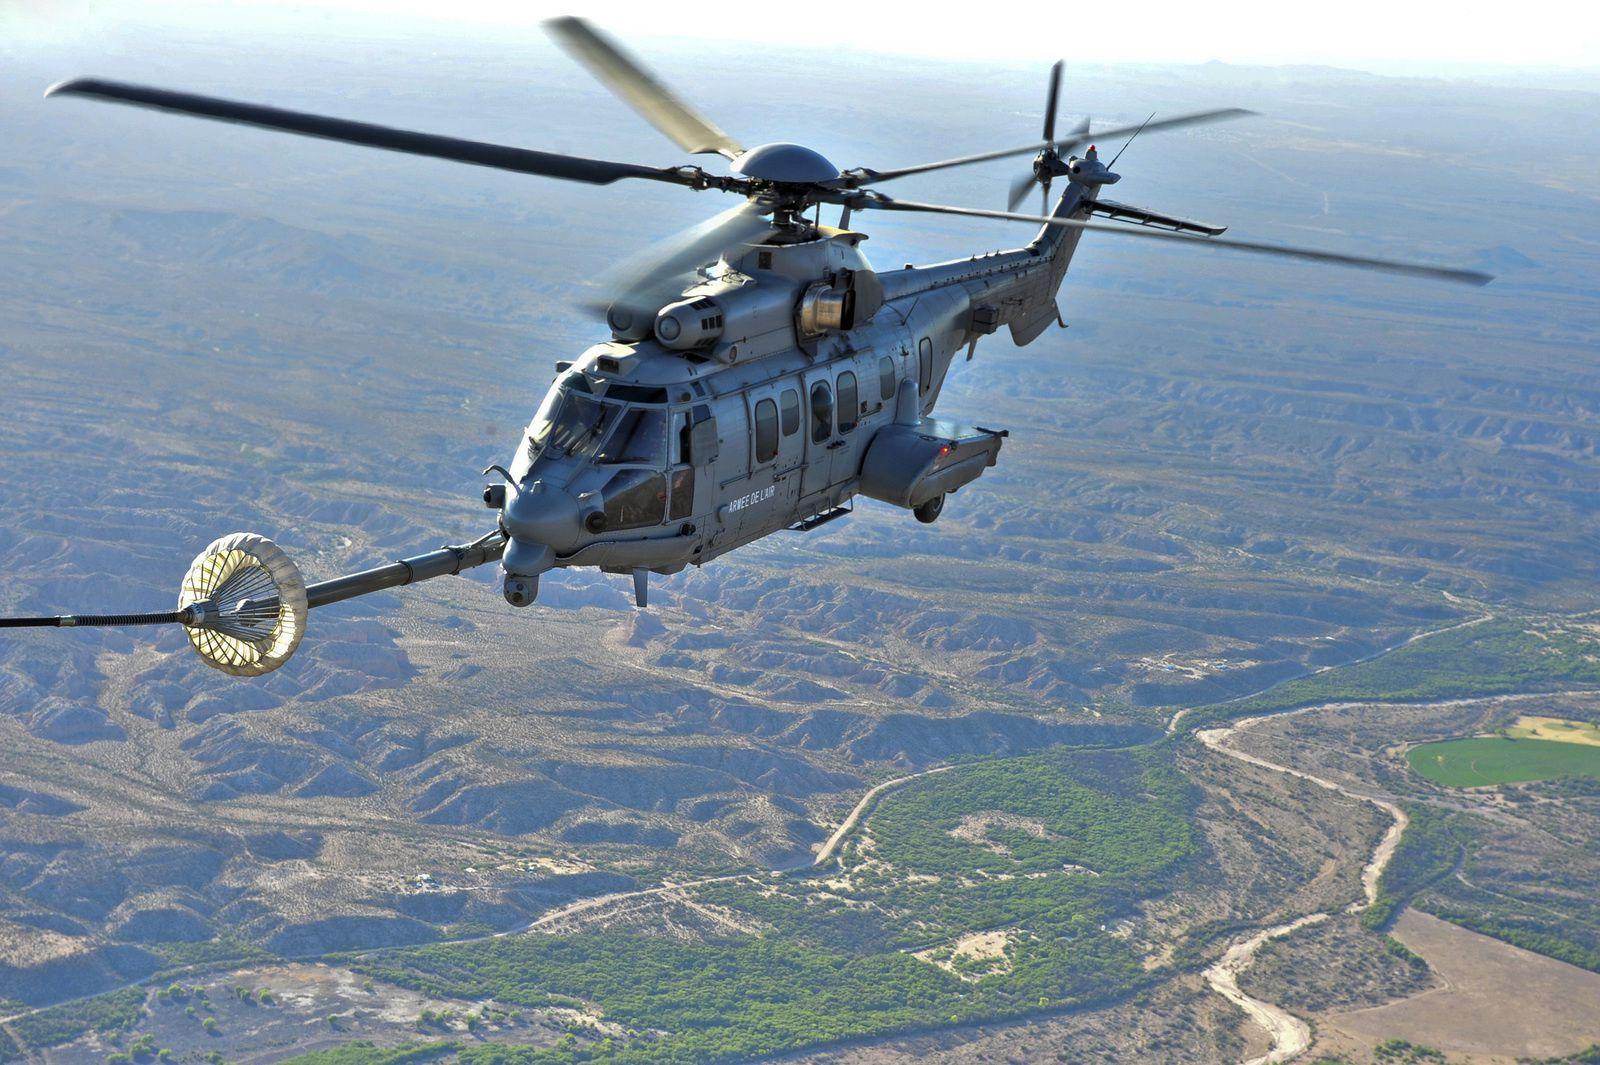 Emerald Warrior : Les Forces spéciales Air s'entraînent avec l'Air Force Special Operations Command